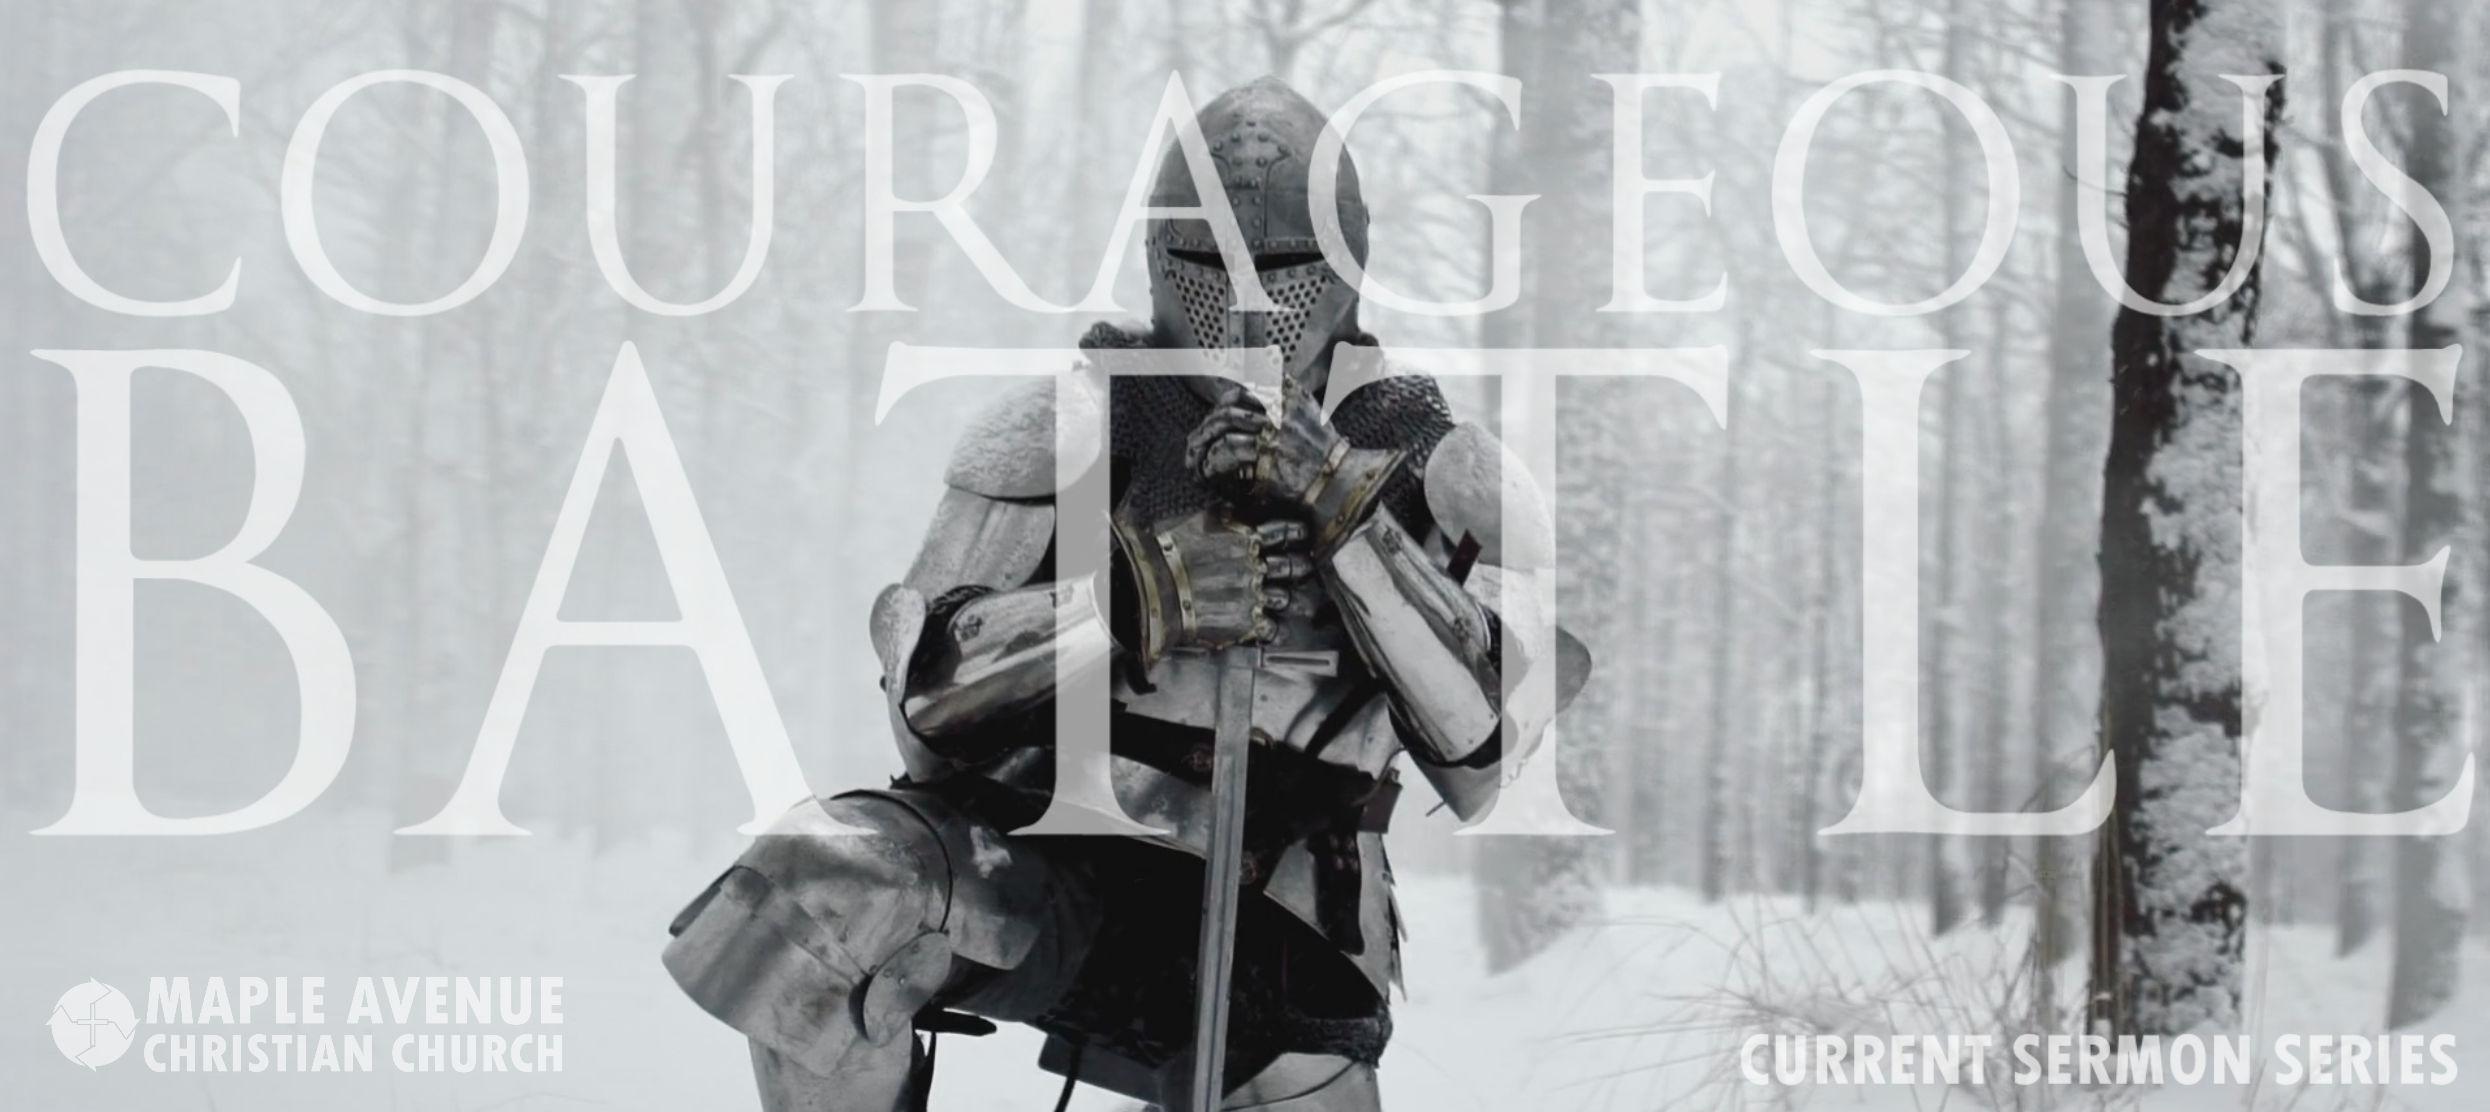 Courageous Battle:  Weapons of Battle